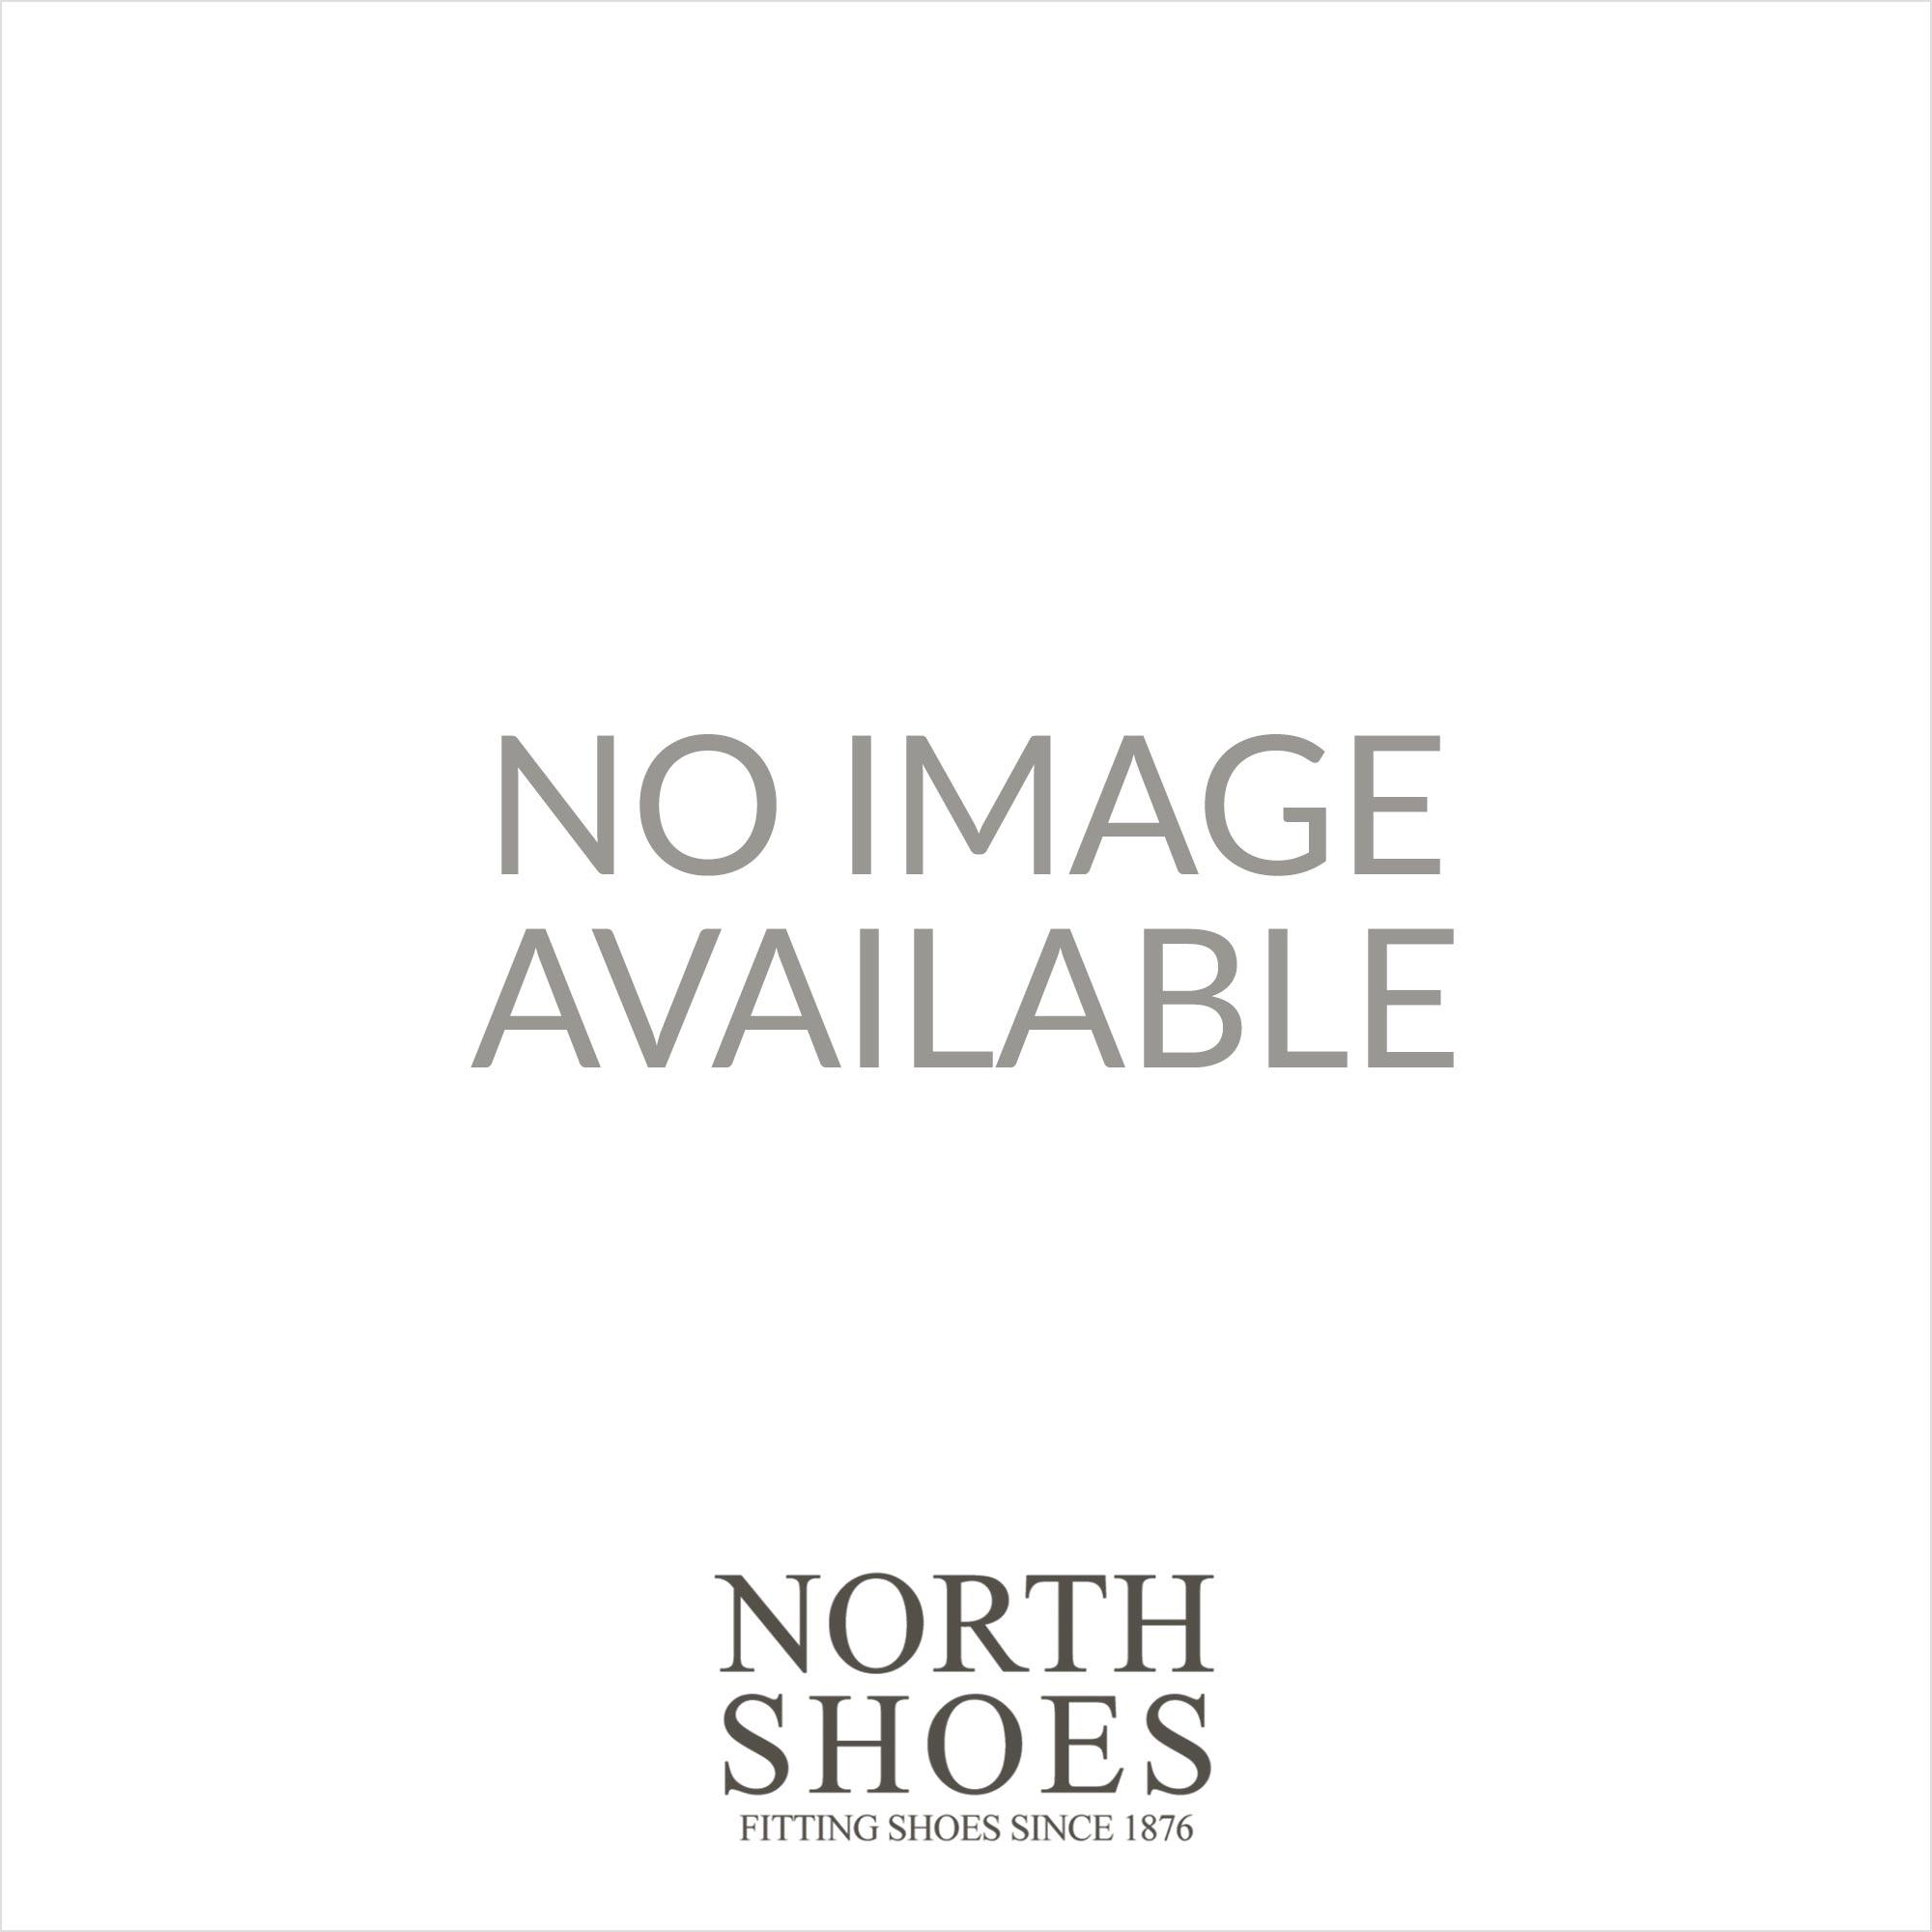 Anzai Fuera de borda derrocamiento  Geox Android Girl J6445A Pink Girls Shoe | SALE | Buy Online UK